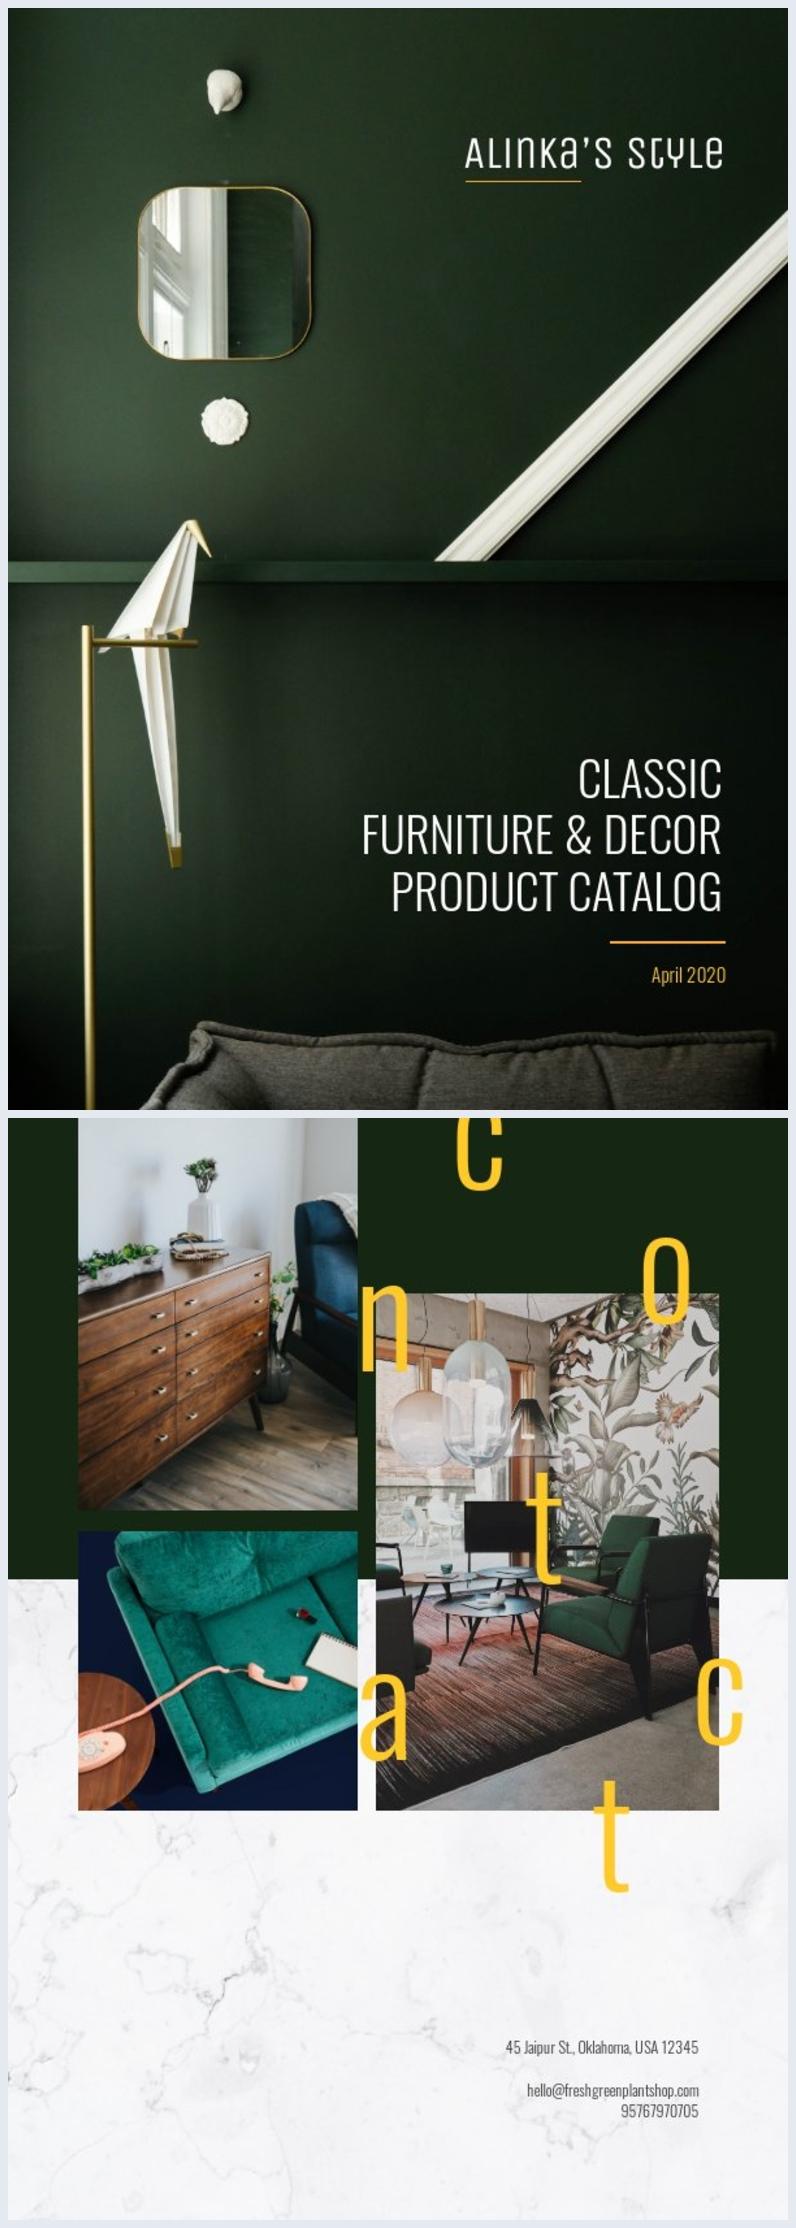 Classic Product Catalog Cover Design